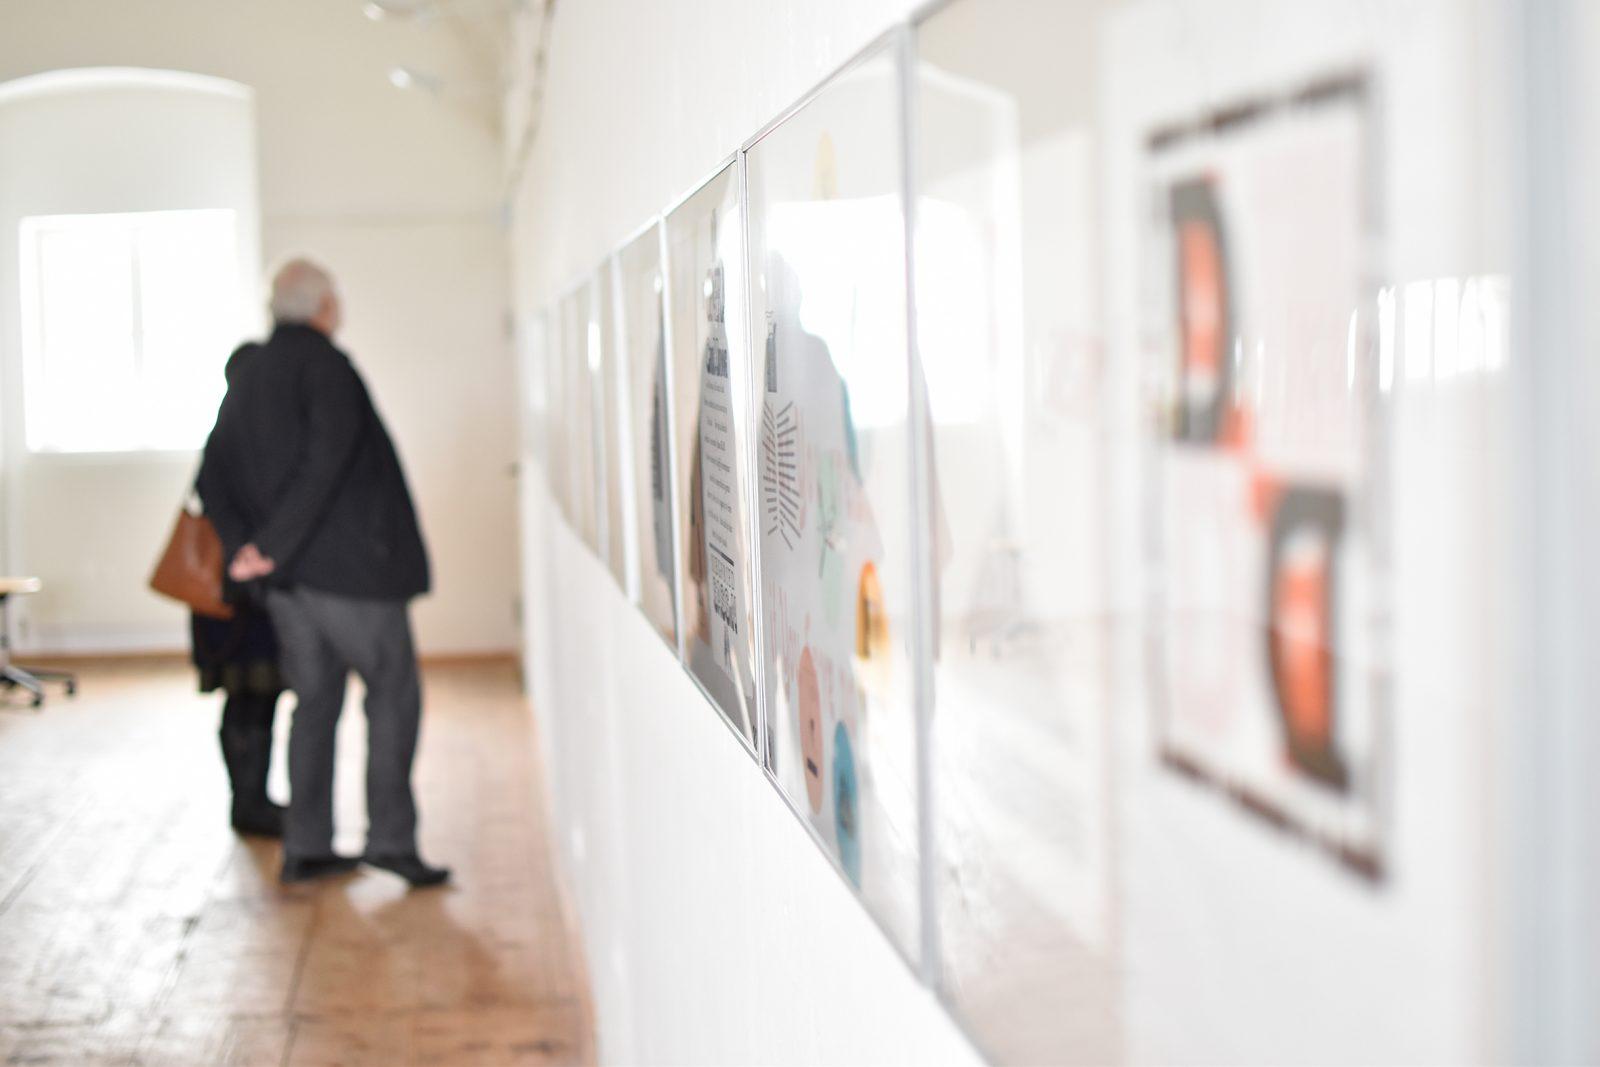 NÖ Waldviertel Galerie Kunst - Kunstverein Horn: KunstNetzWerk SAKU